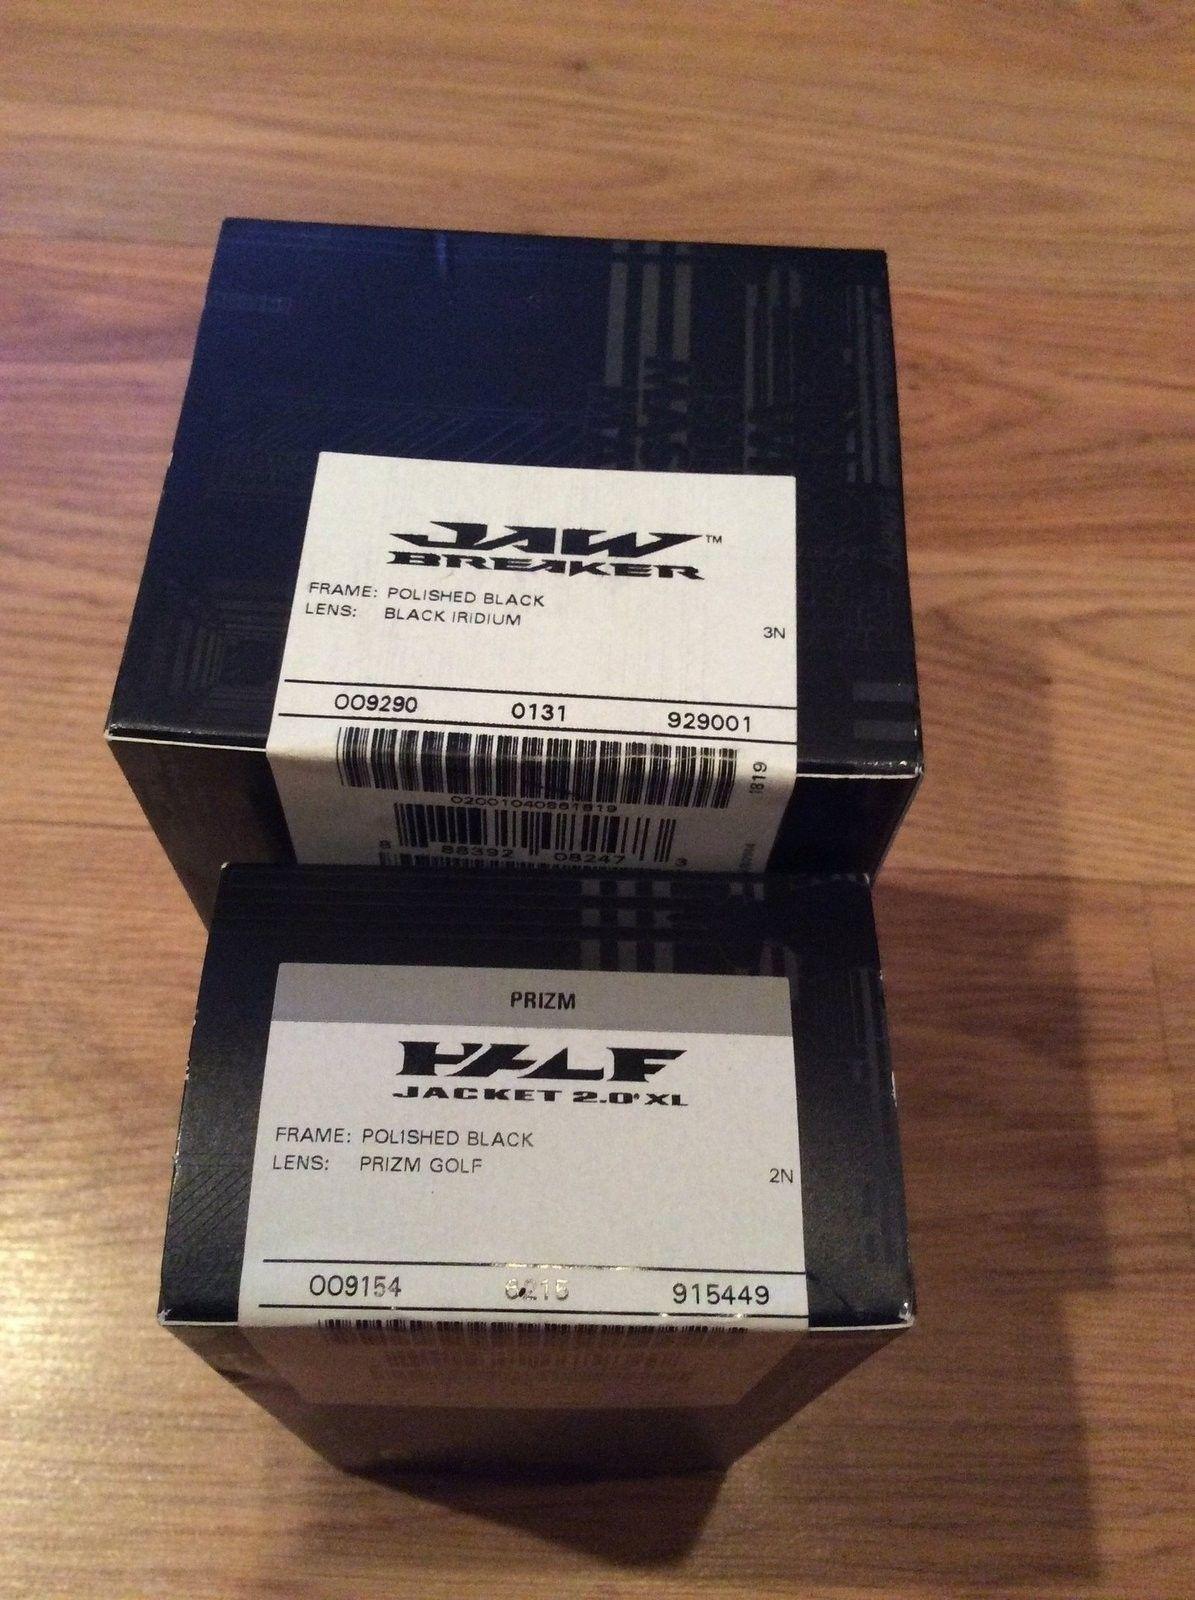 BNIB Jawbreaker Bundle $130 Shipped - image.jpeg